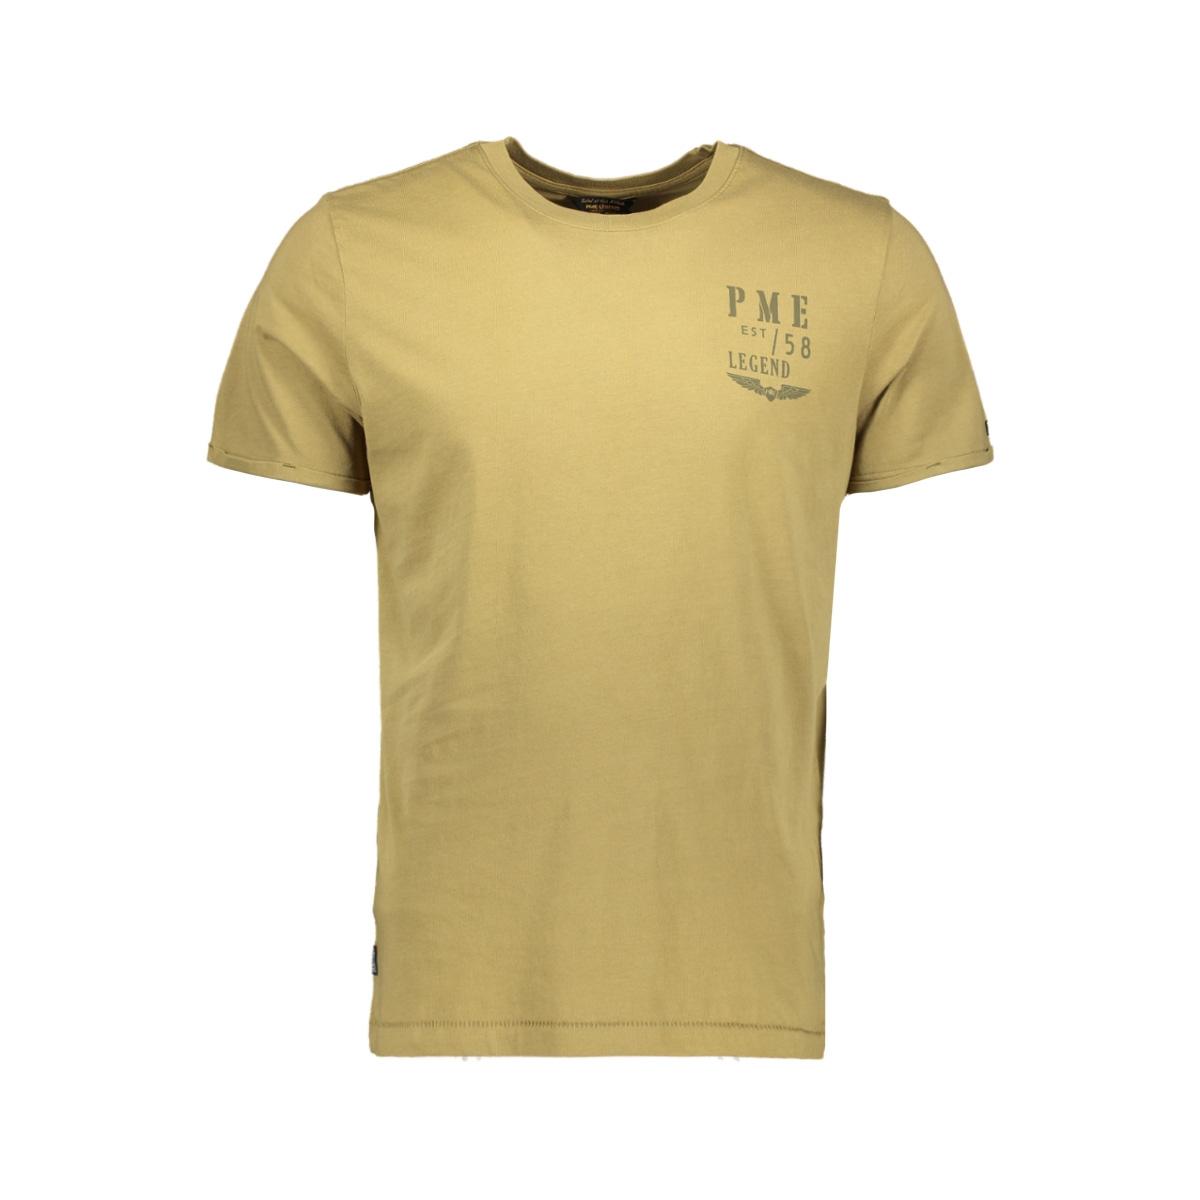 single jersey garment dye t shirt ptss202566 pme legend t-shirt 6408